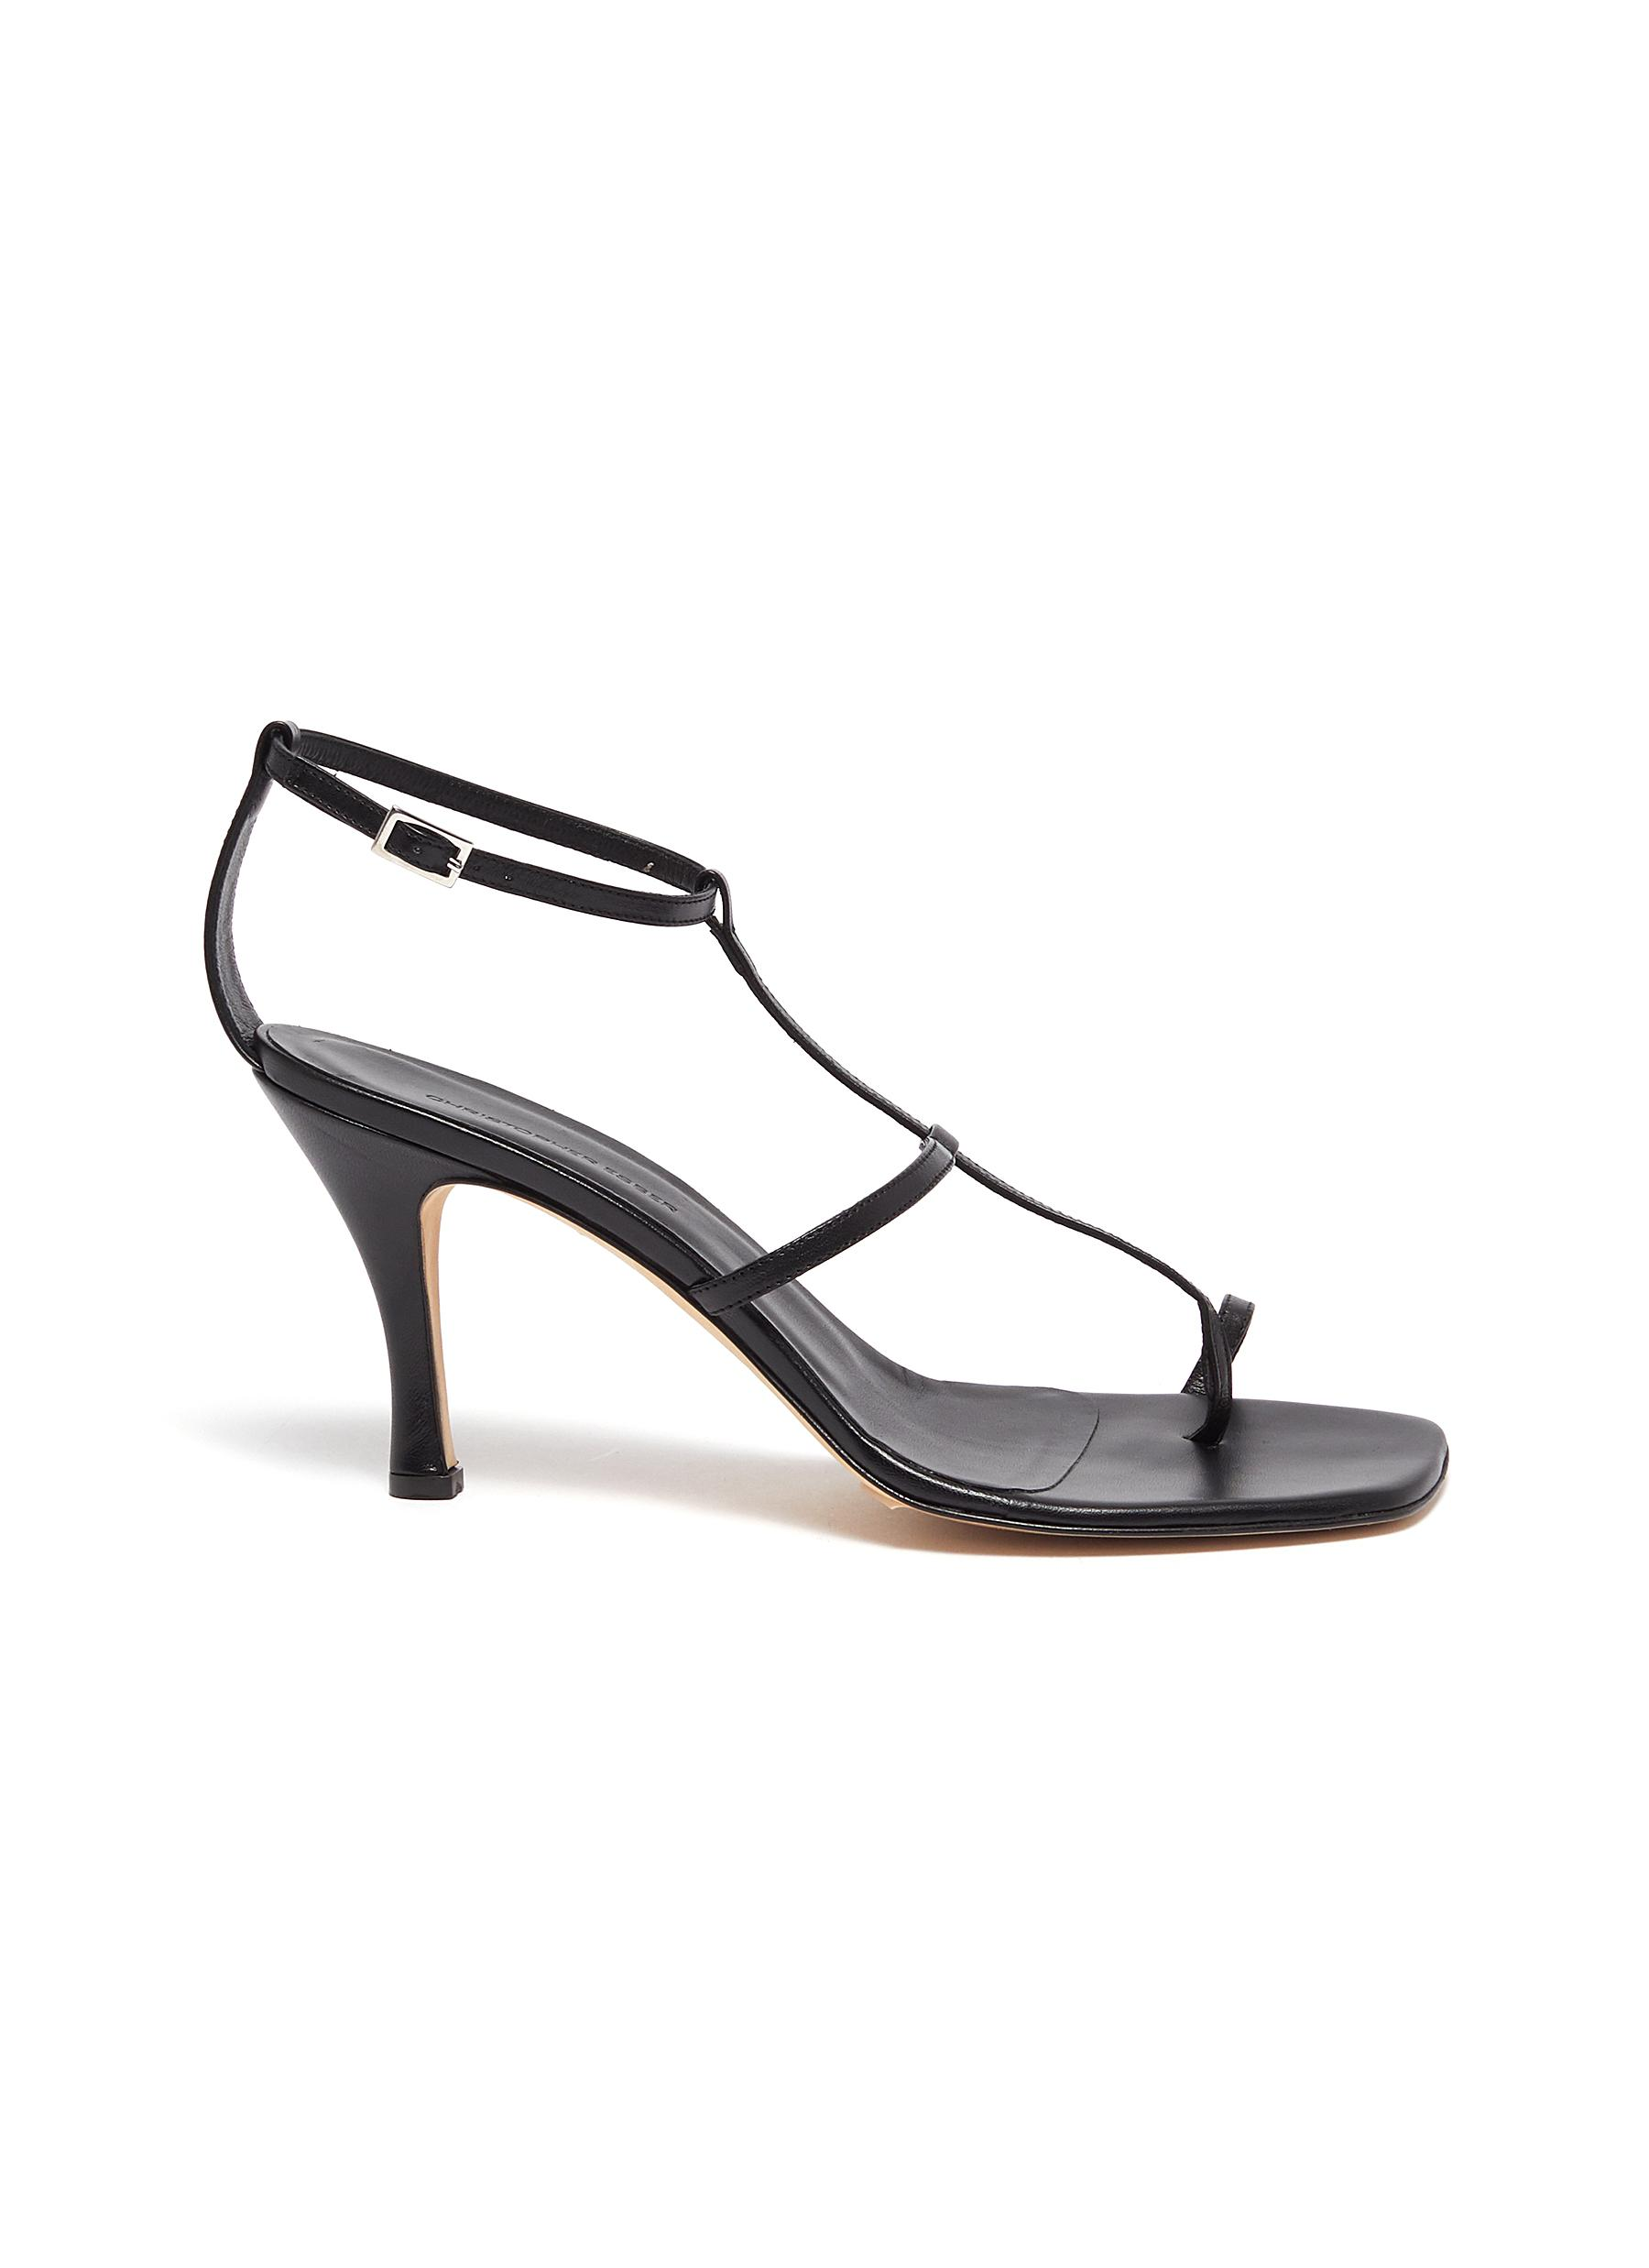 Christopher Esber High Heels Rubik strappy sandals